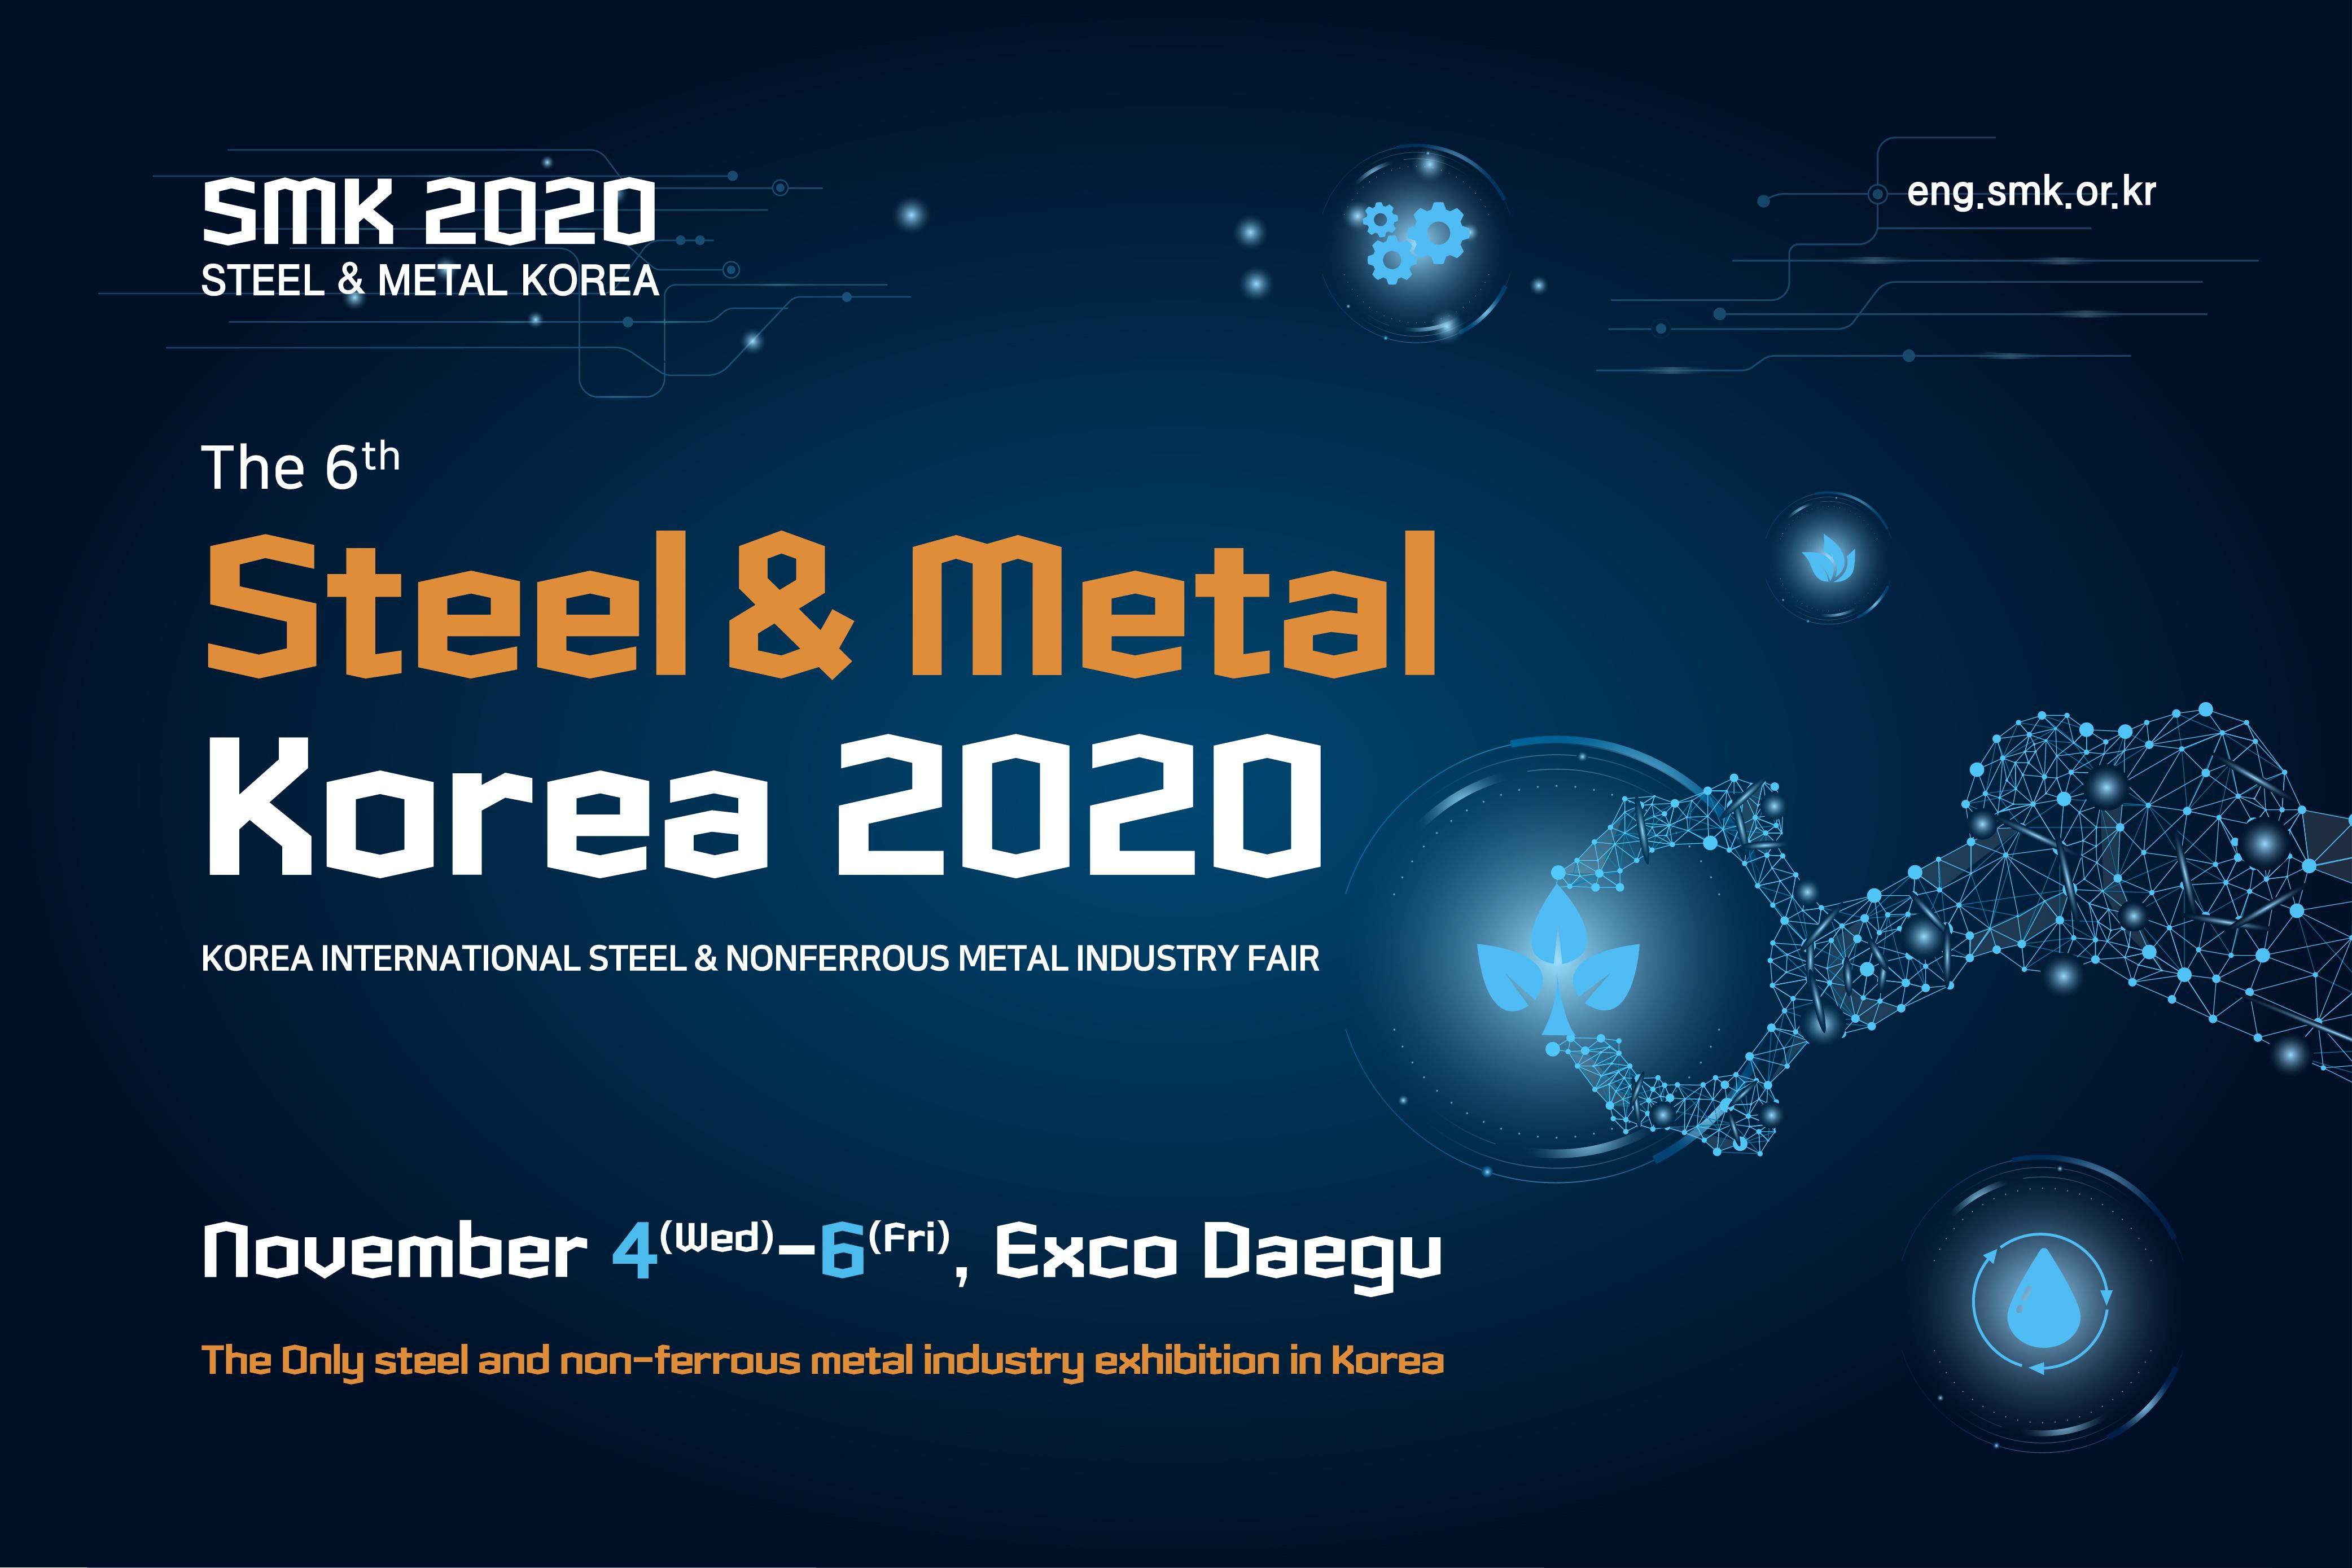 STEEL & METAL KOREA 2020